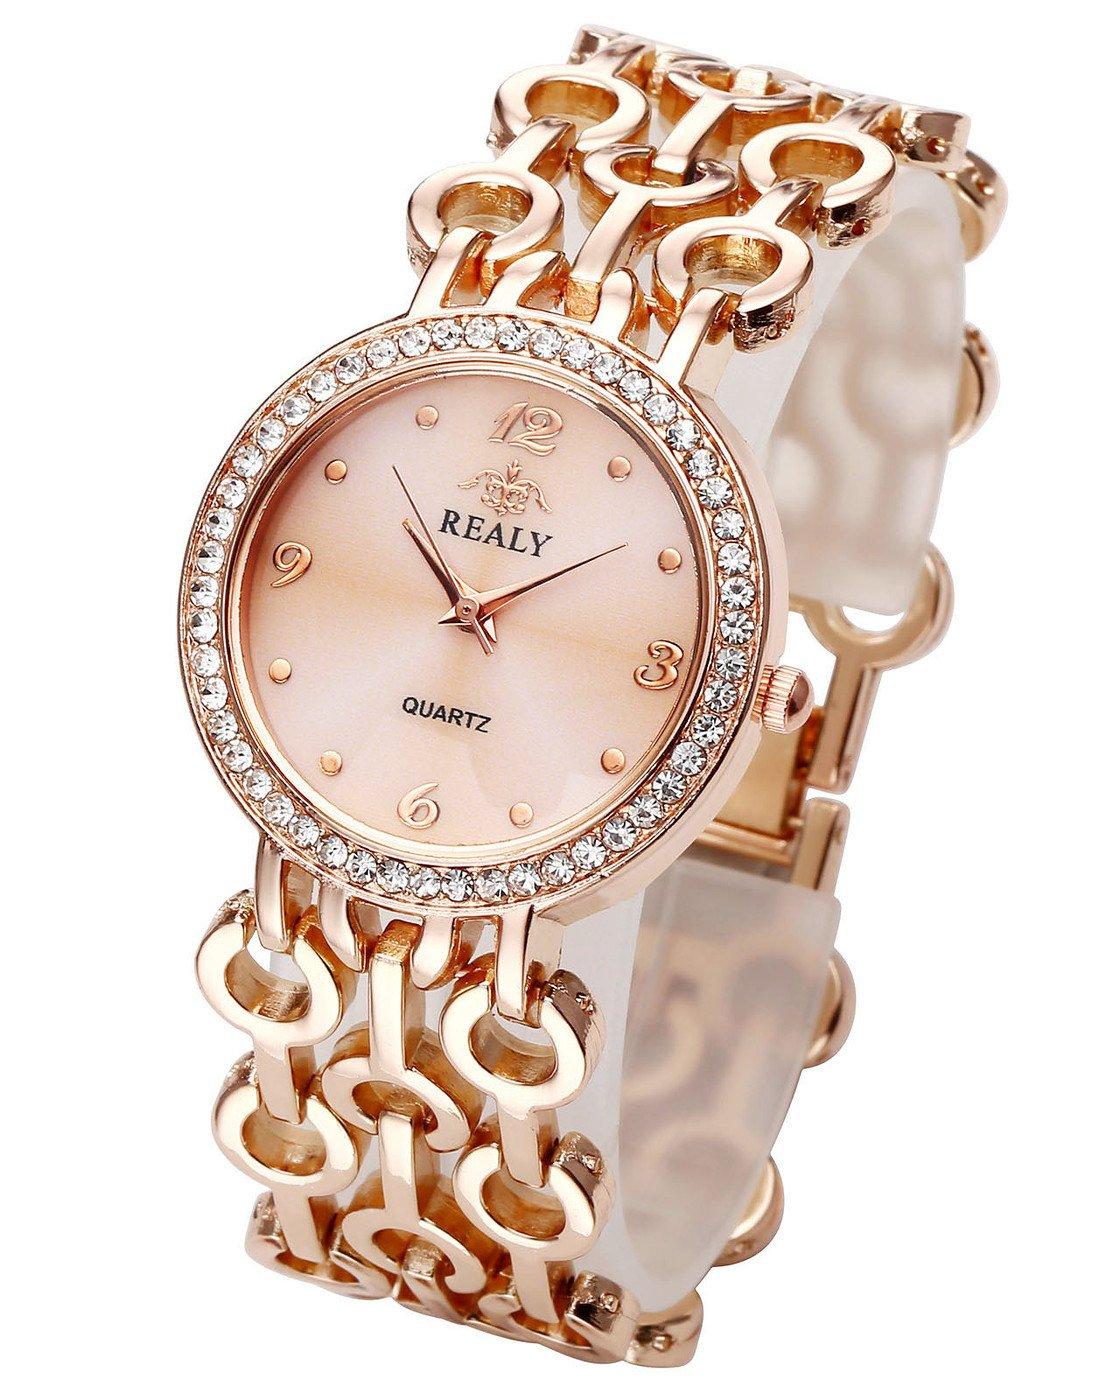 Top Plaza Women Elegant Fashion Bracelet Analog Quartz Watch Rose Gold Tone Rhinestone Case Big Face Large Dial Wide Band Waterproof Cuff Watch by Top Plaza (Image #1)